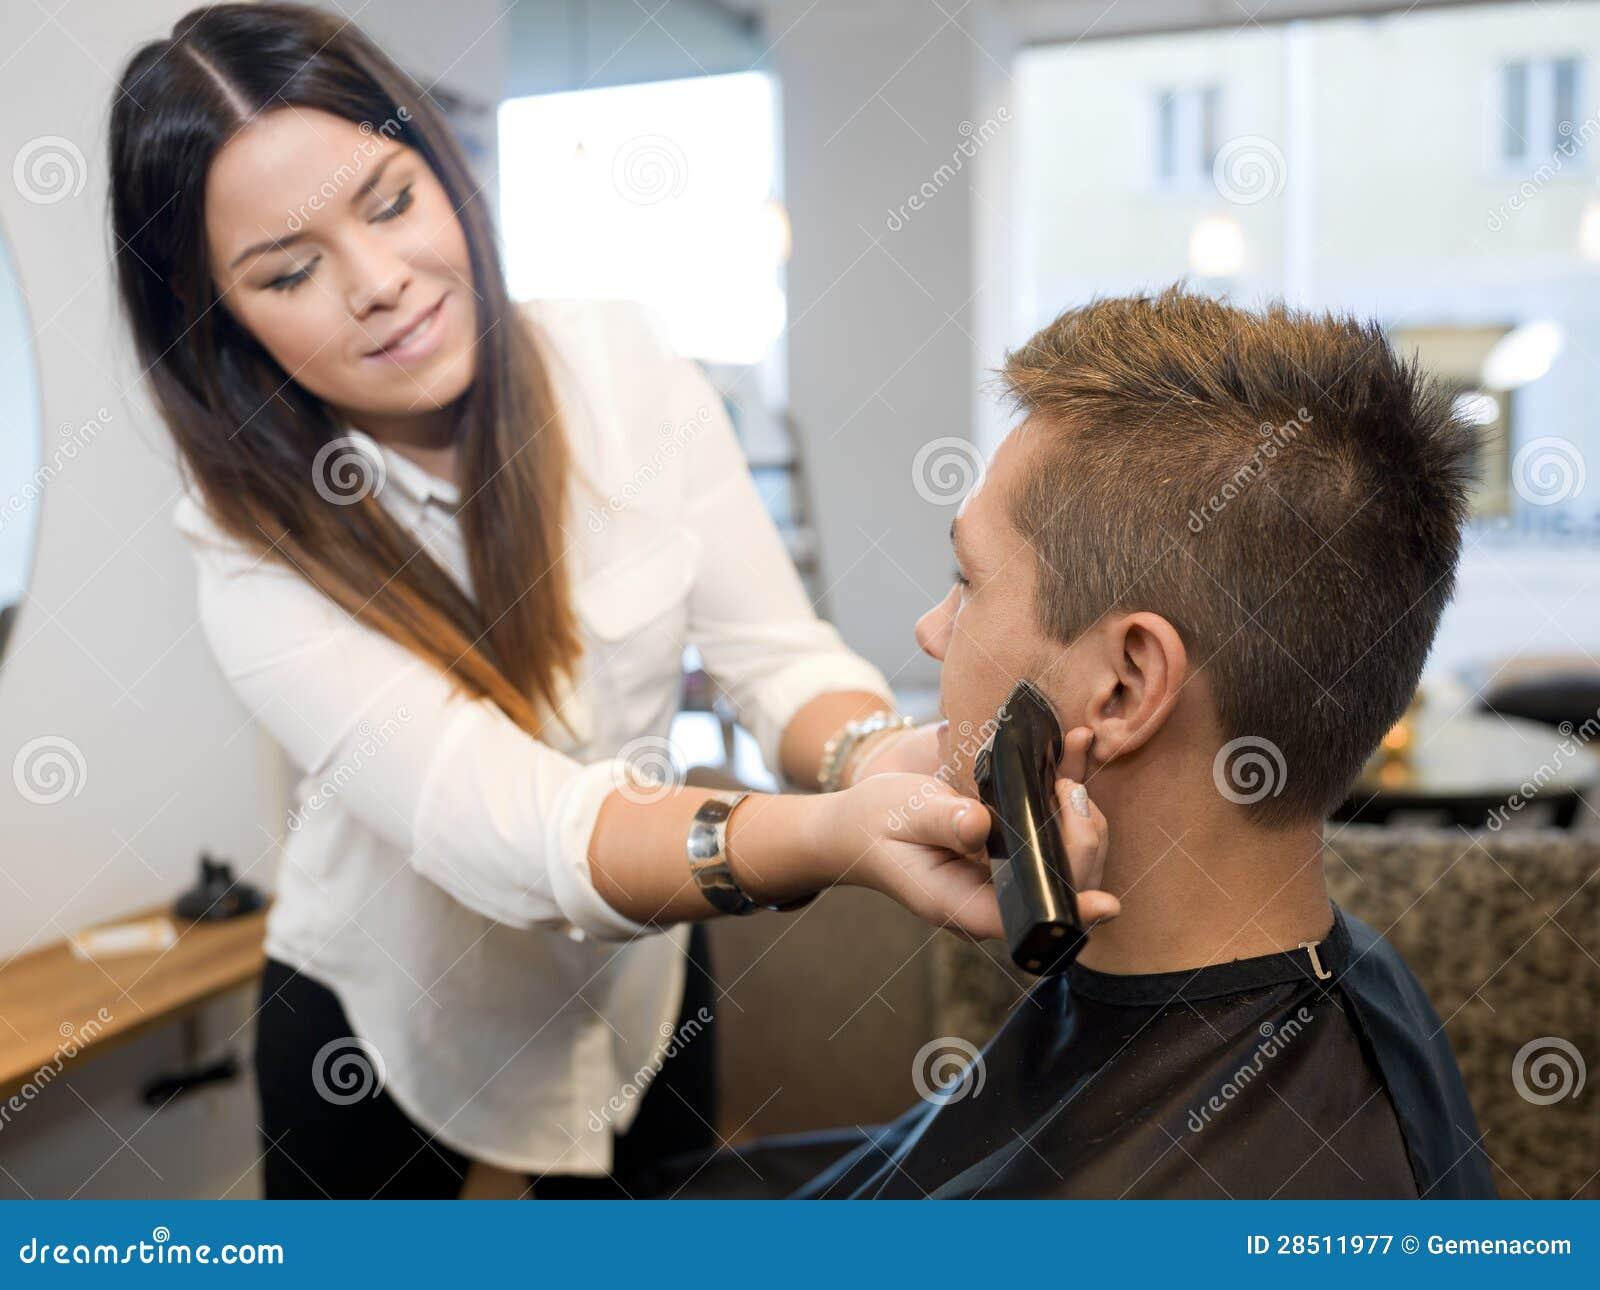 Men Hair Salon : Man In Beauty Salon Royalty Free Stock Photography - Image: 28511977